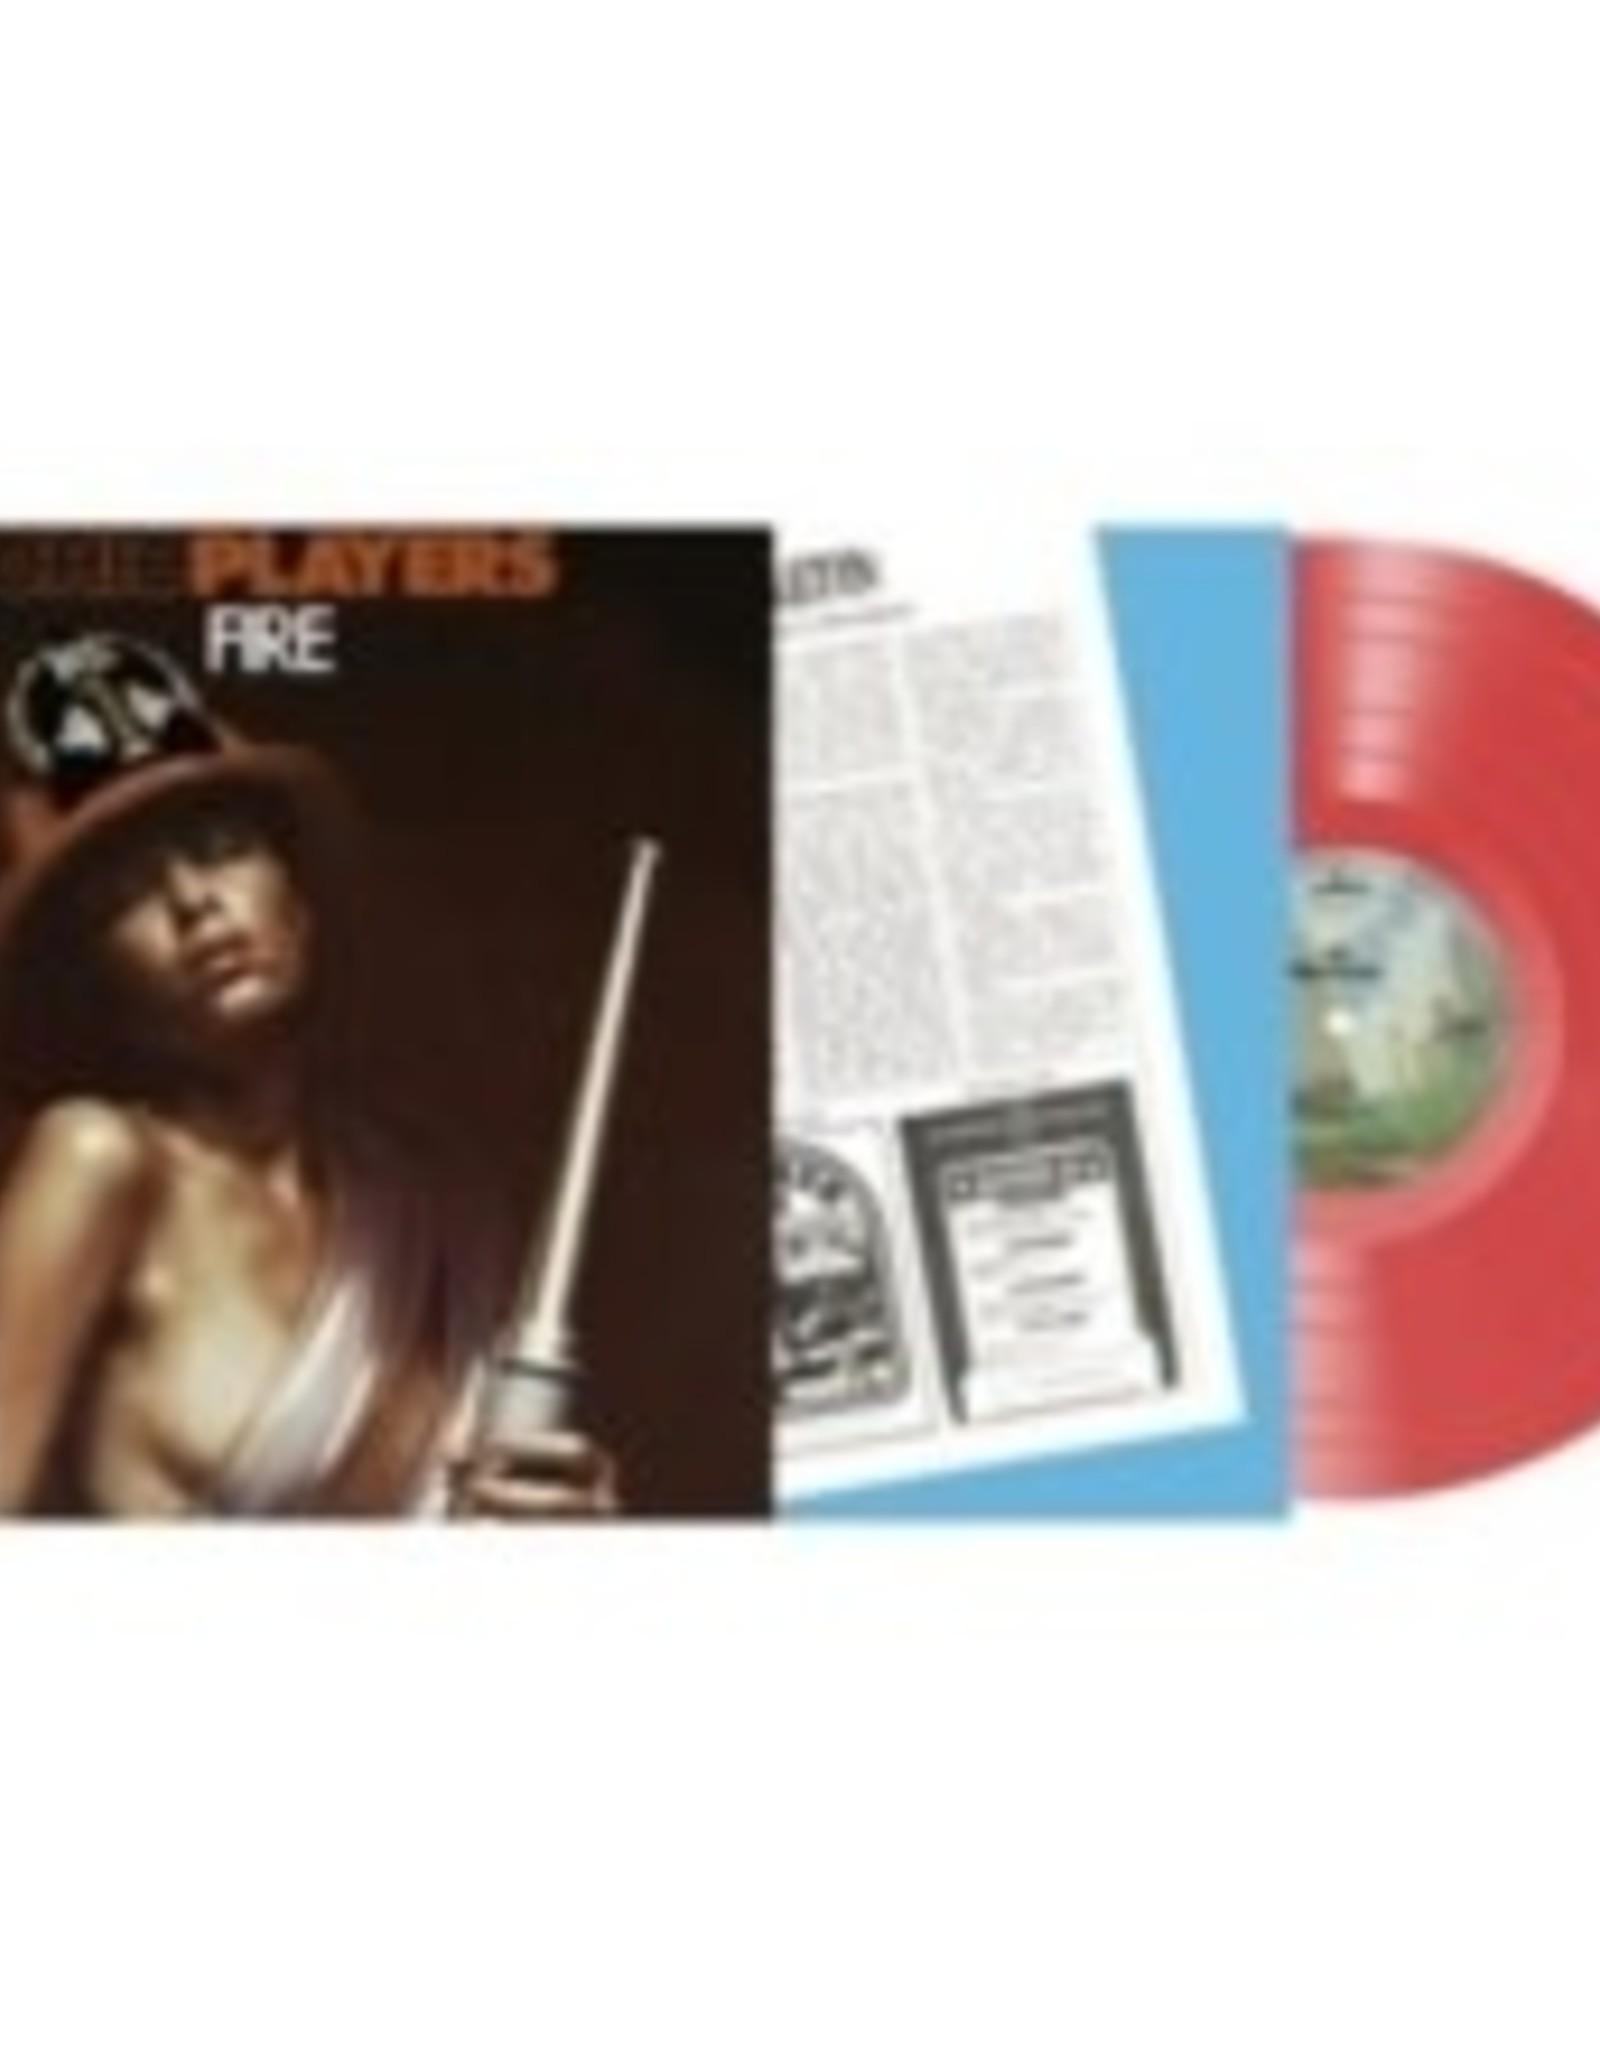 Ohio Players - Fire (Red Translucent Vinyl)